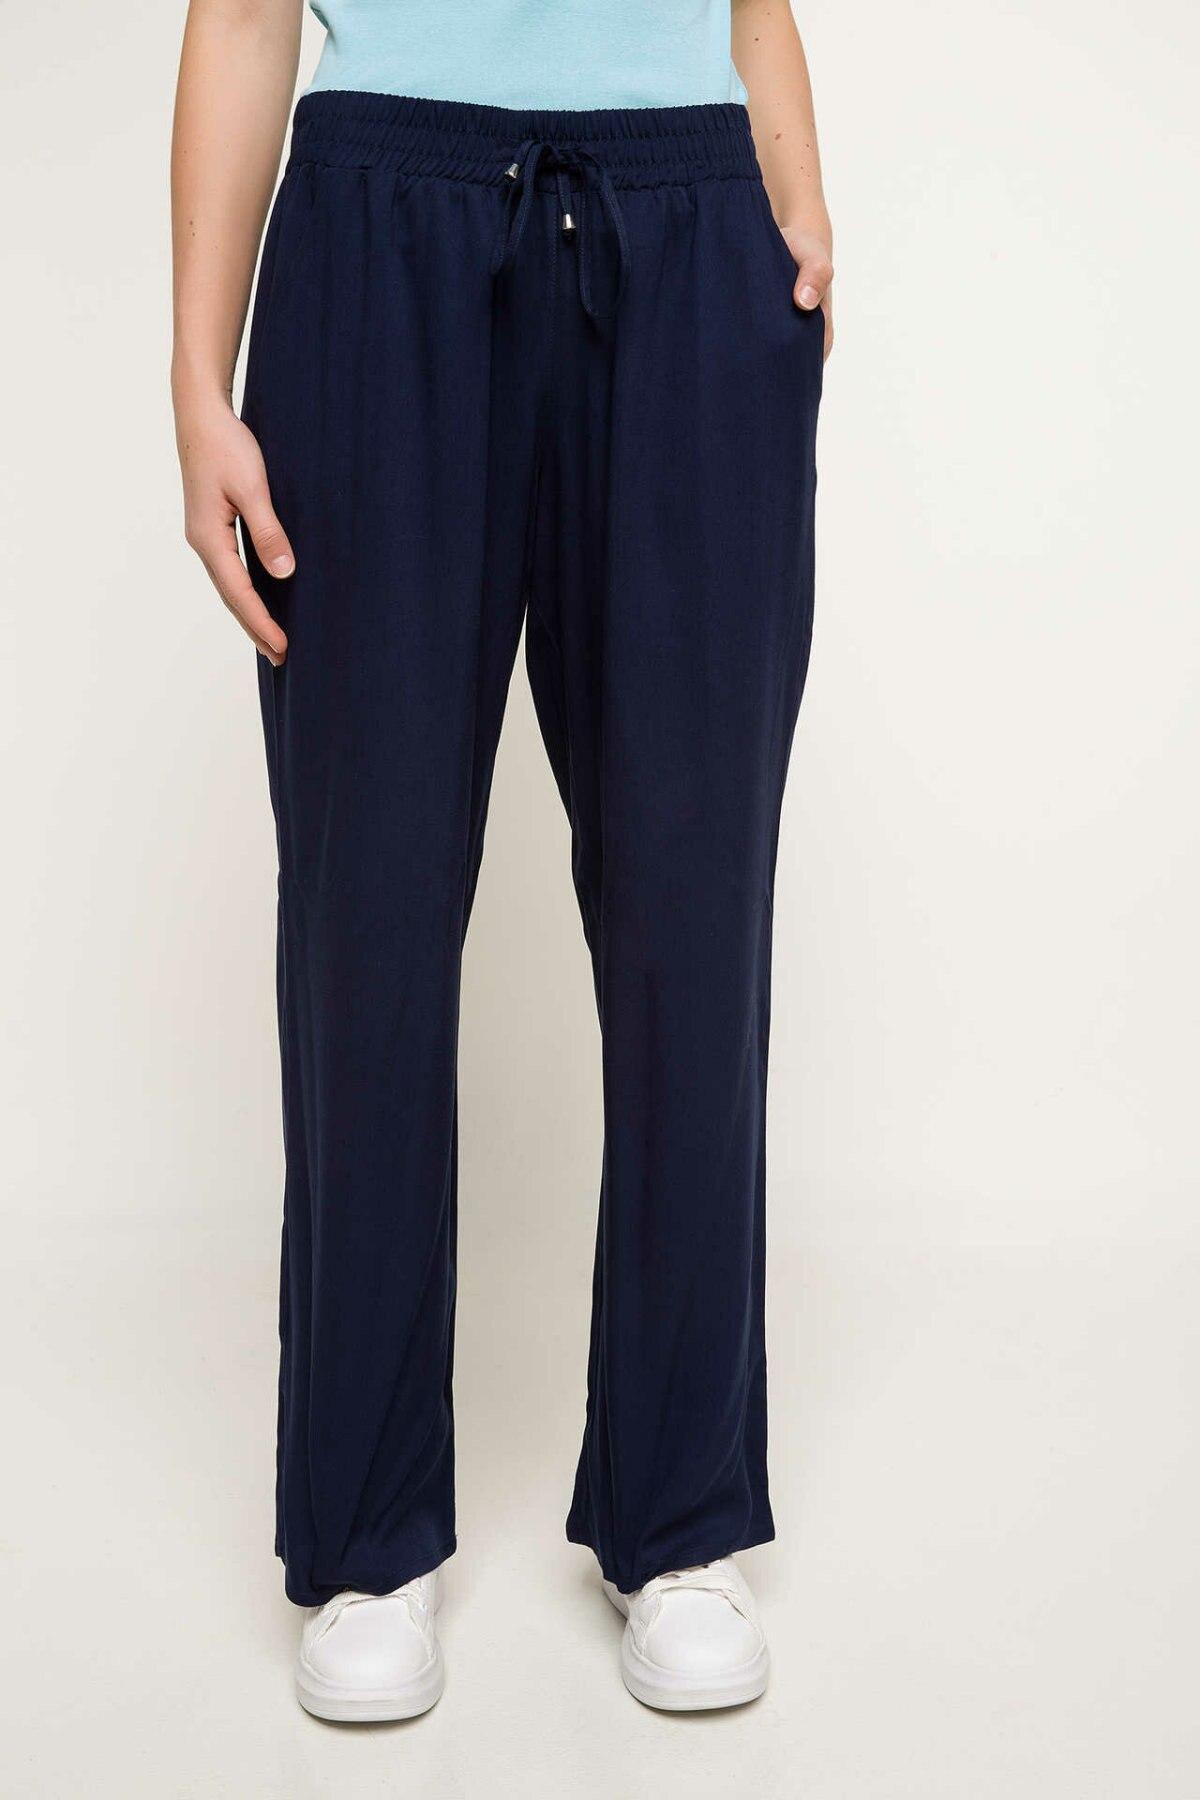 DeFacto Women Wide Leg Trousers Women Black Green Solid Color Long Pants Adjustable Casual Long Trousers Bottoms-I3714AZ18SM